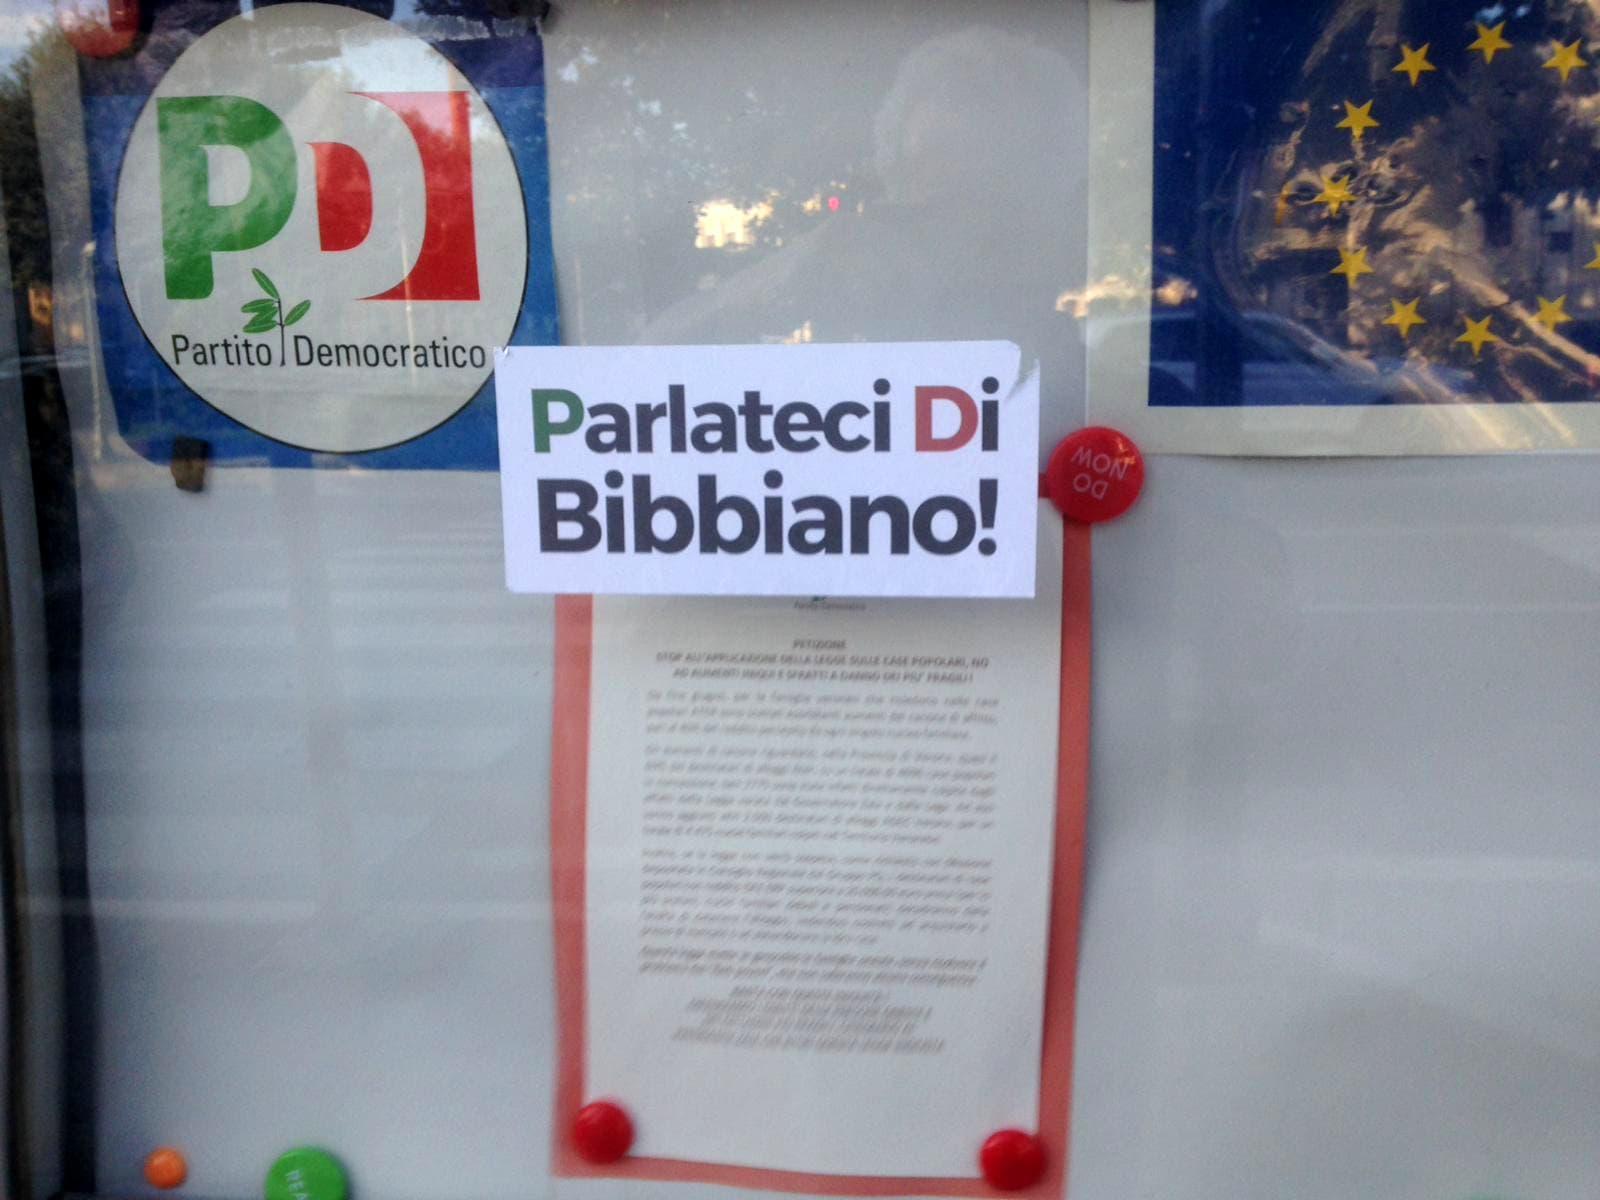 bacheca pd san martino buon albergo vandalismo-2